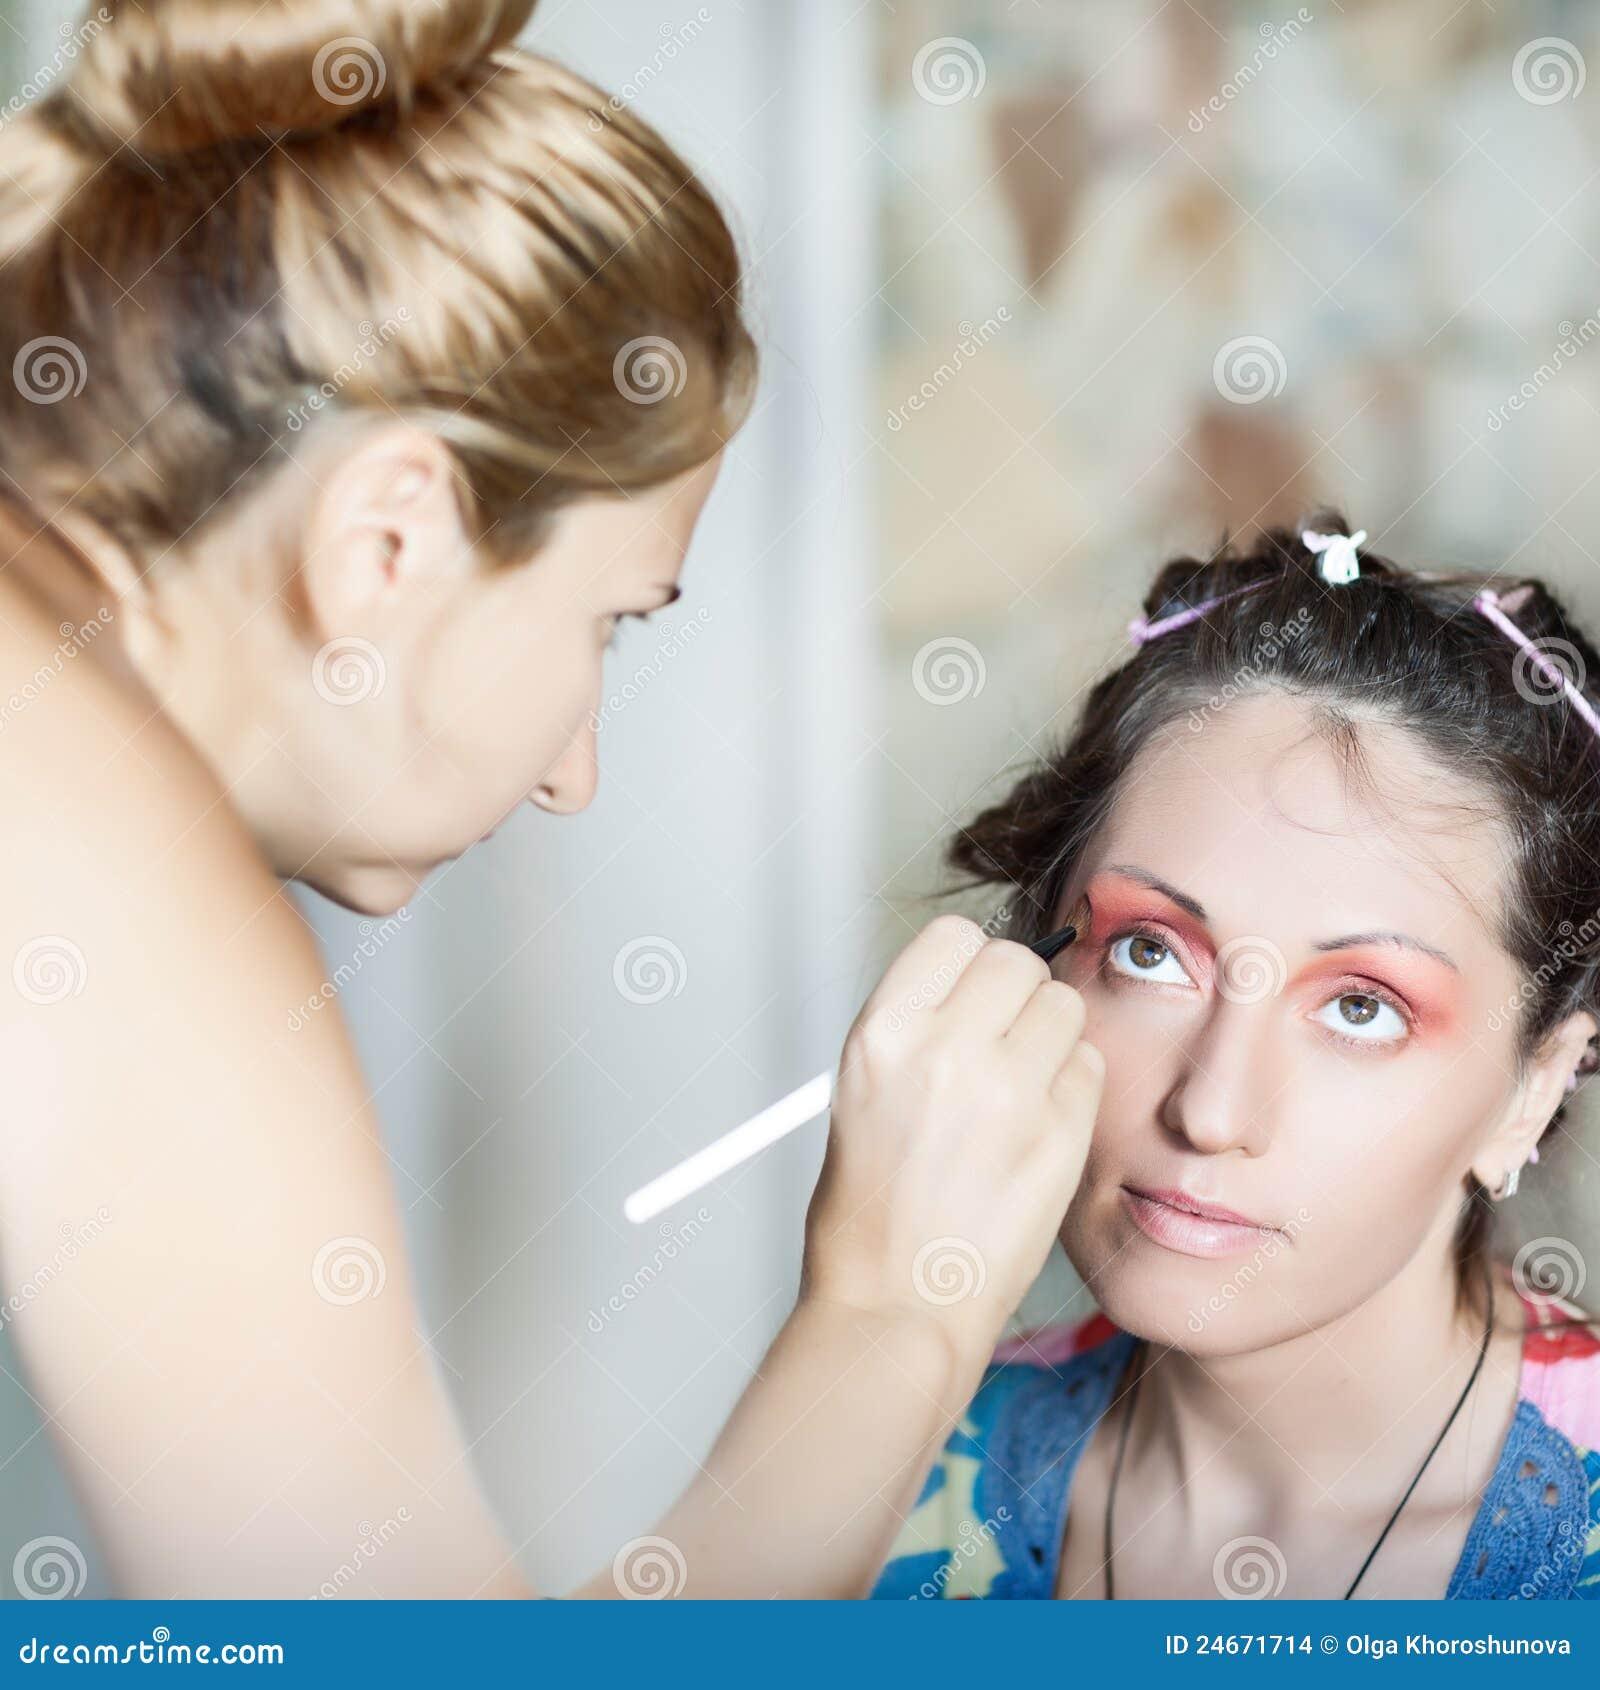 Beauty salon stock images image 24671714 for Reading beauty salon